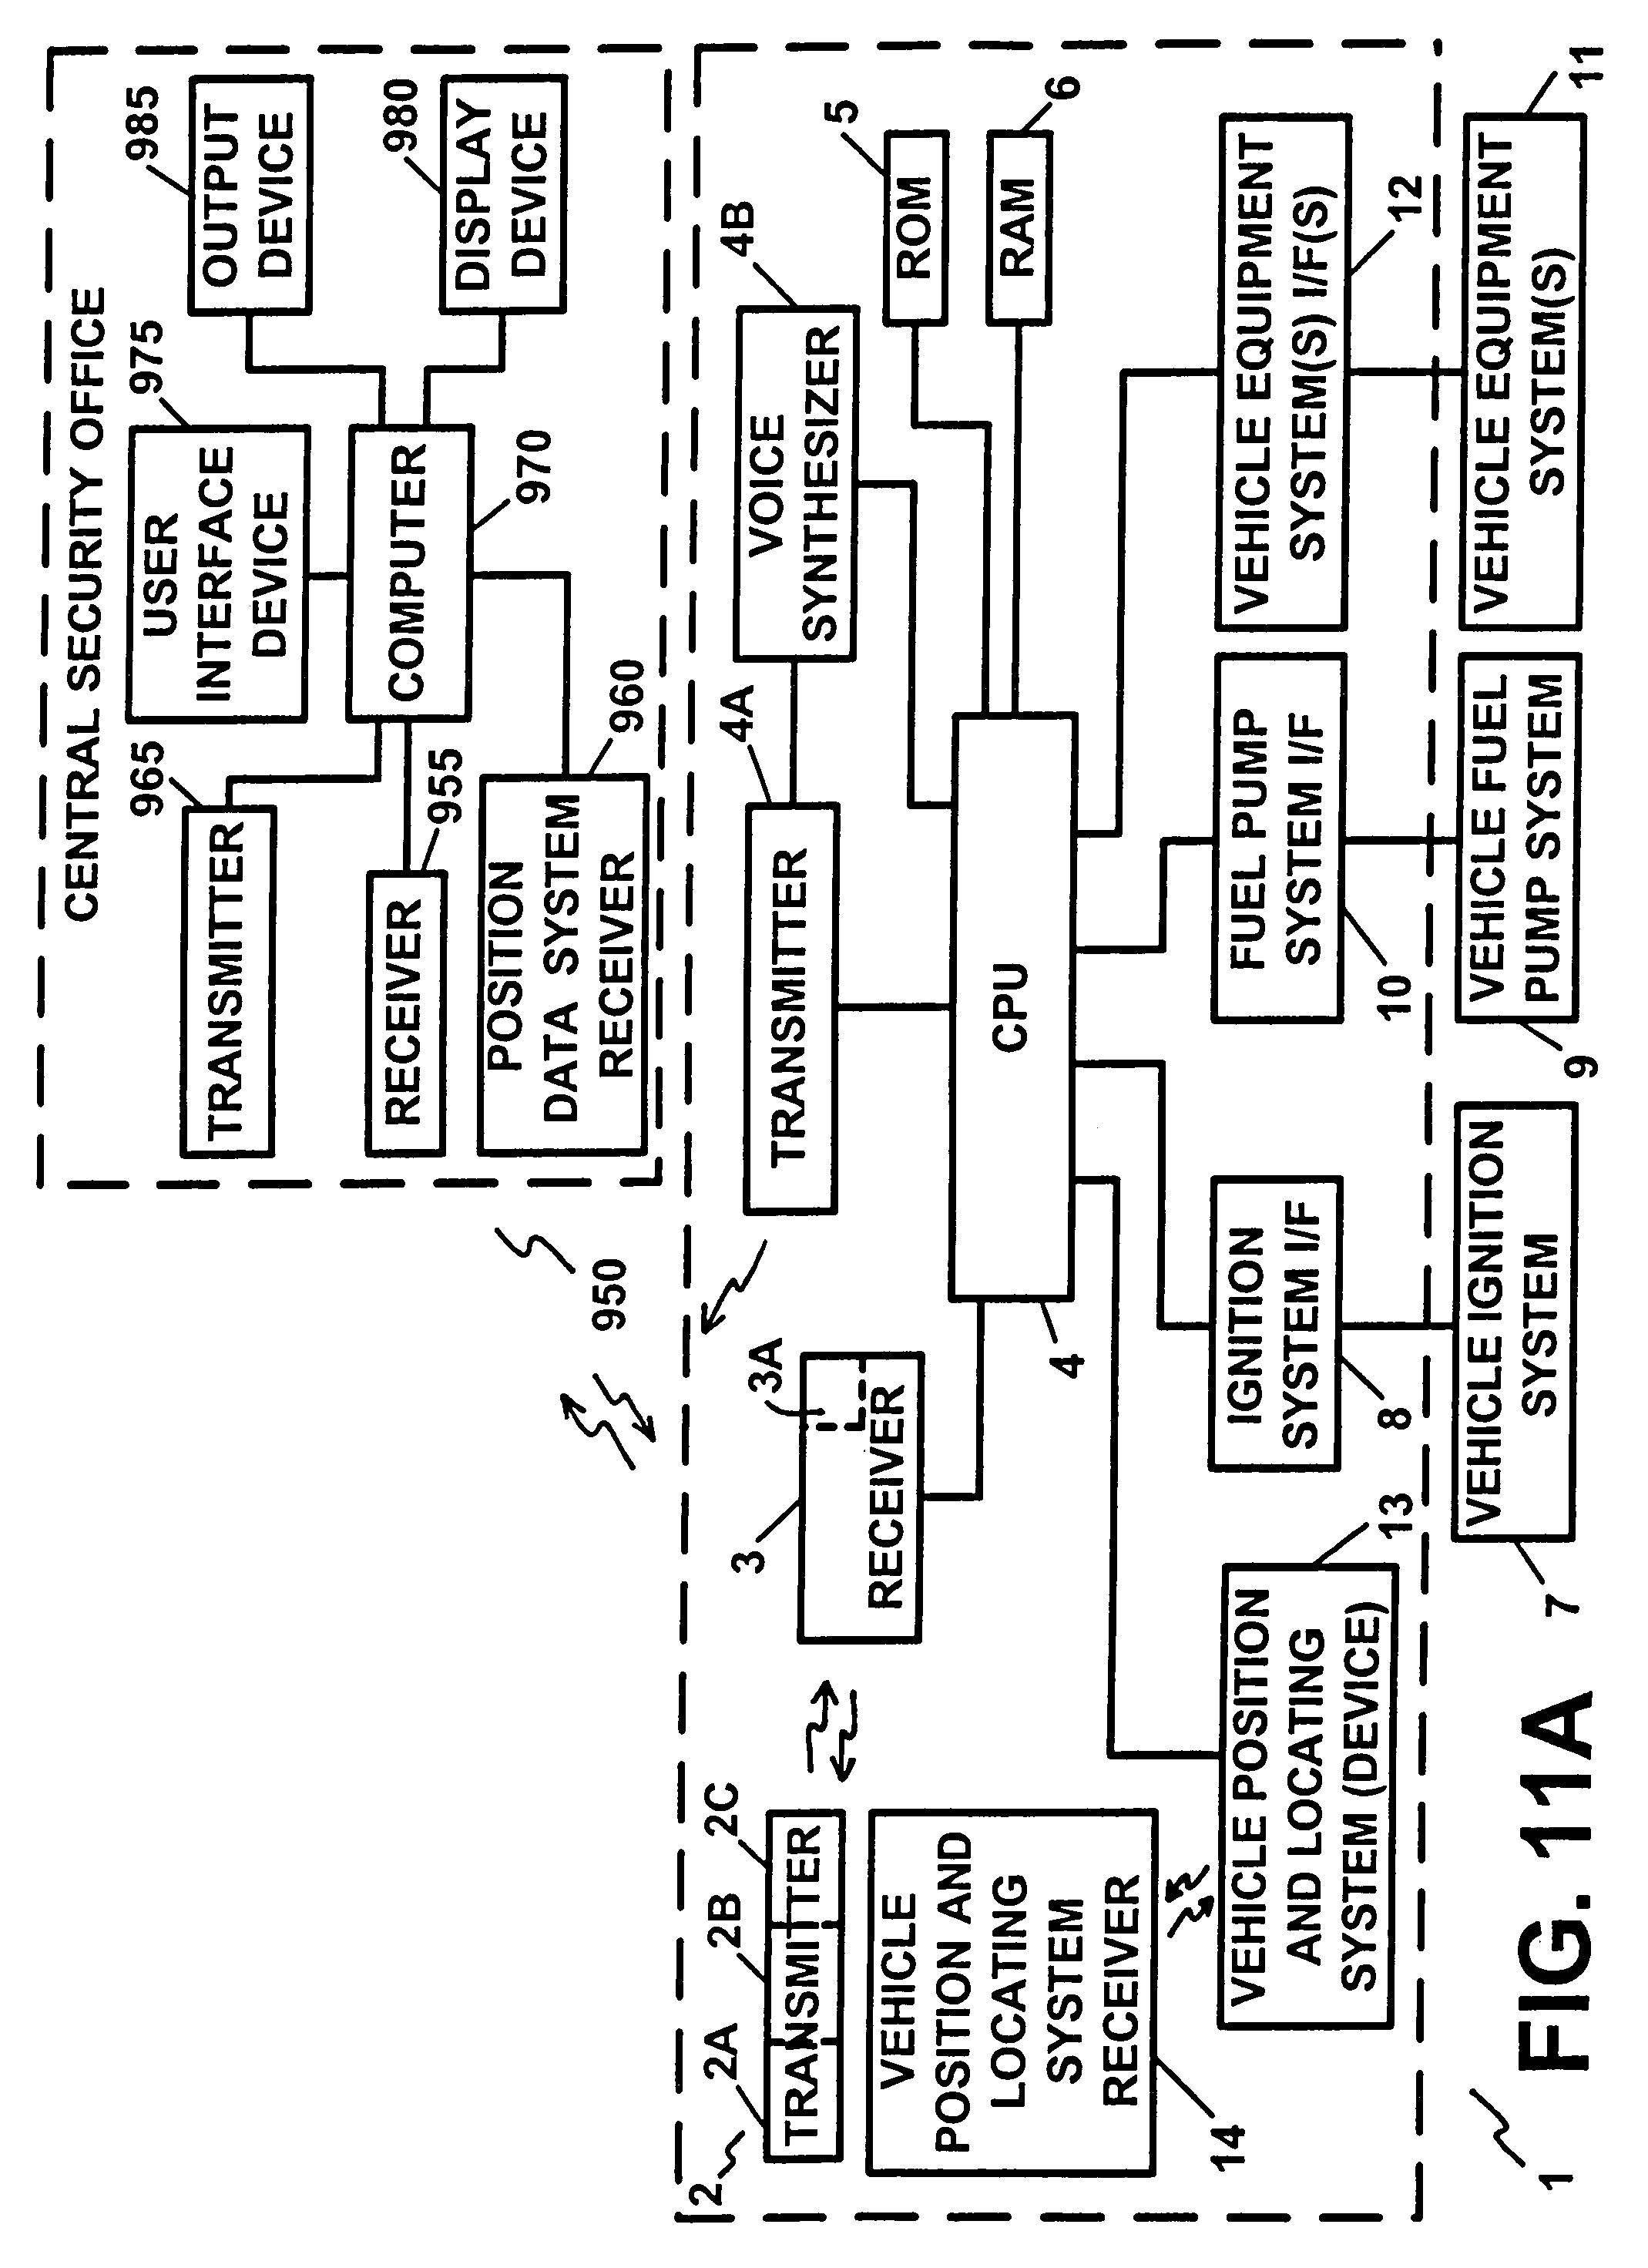 Patent US 10,152,876 B2